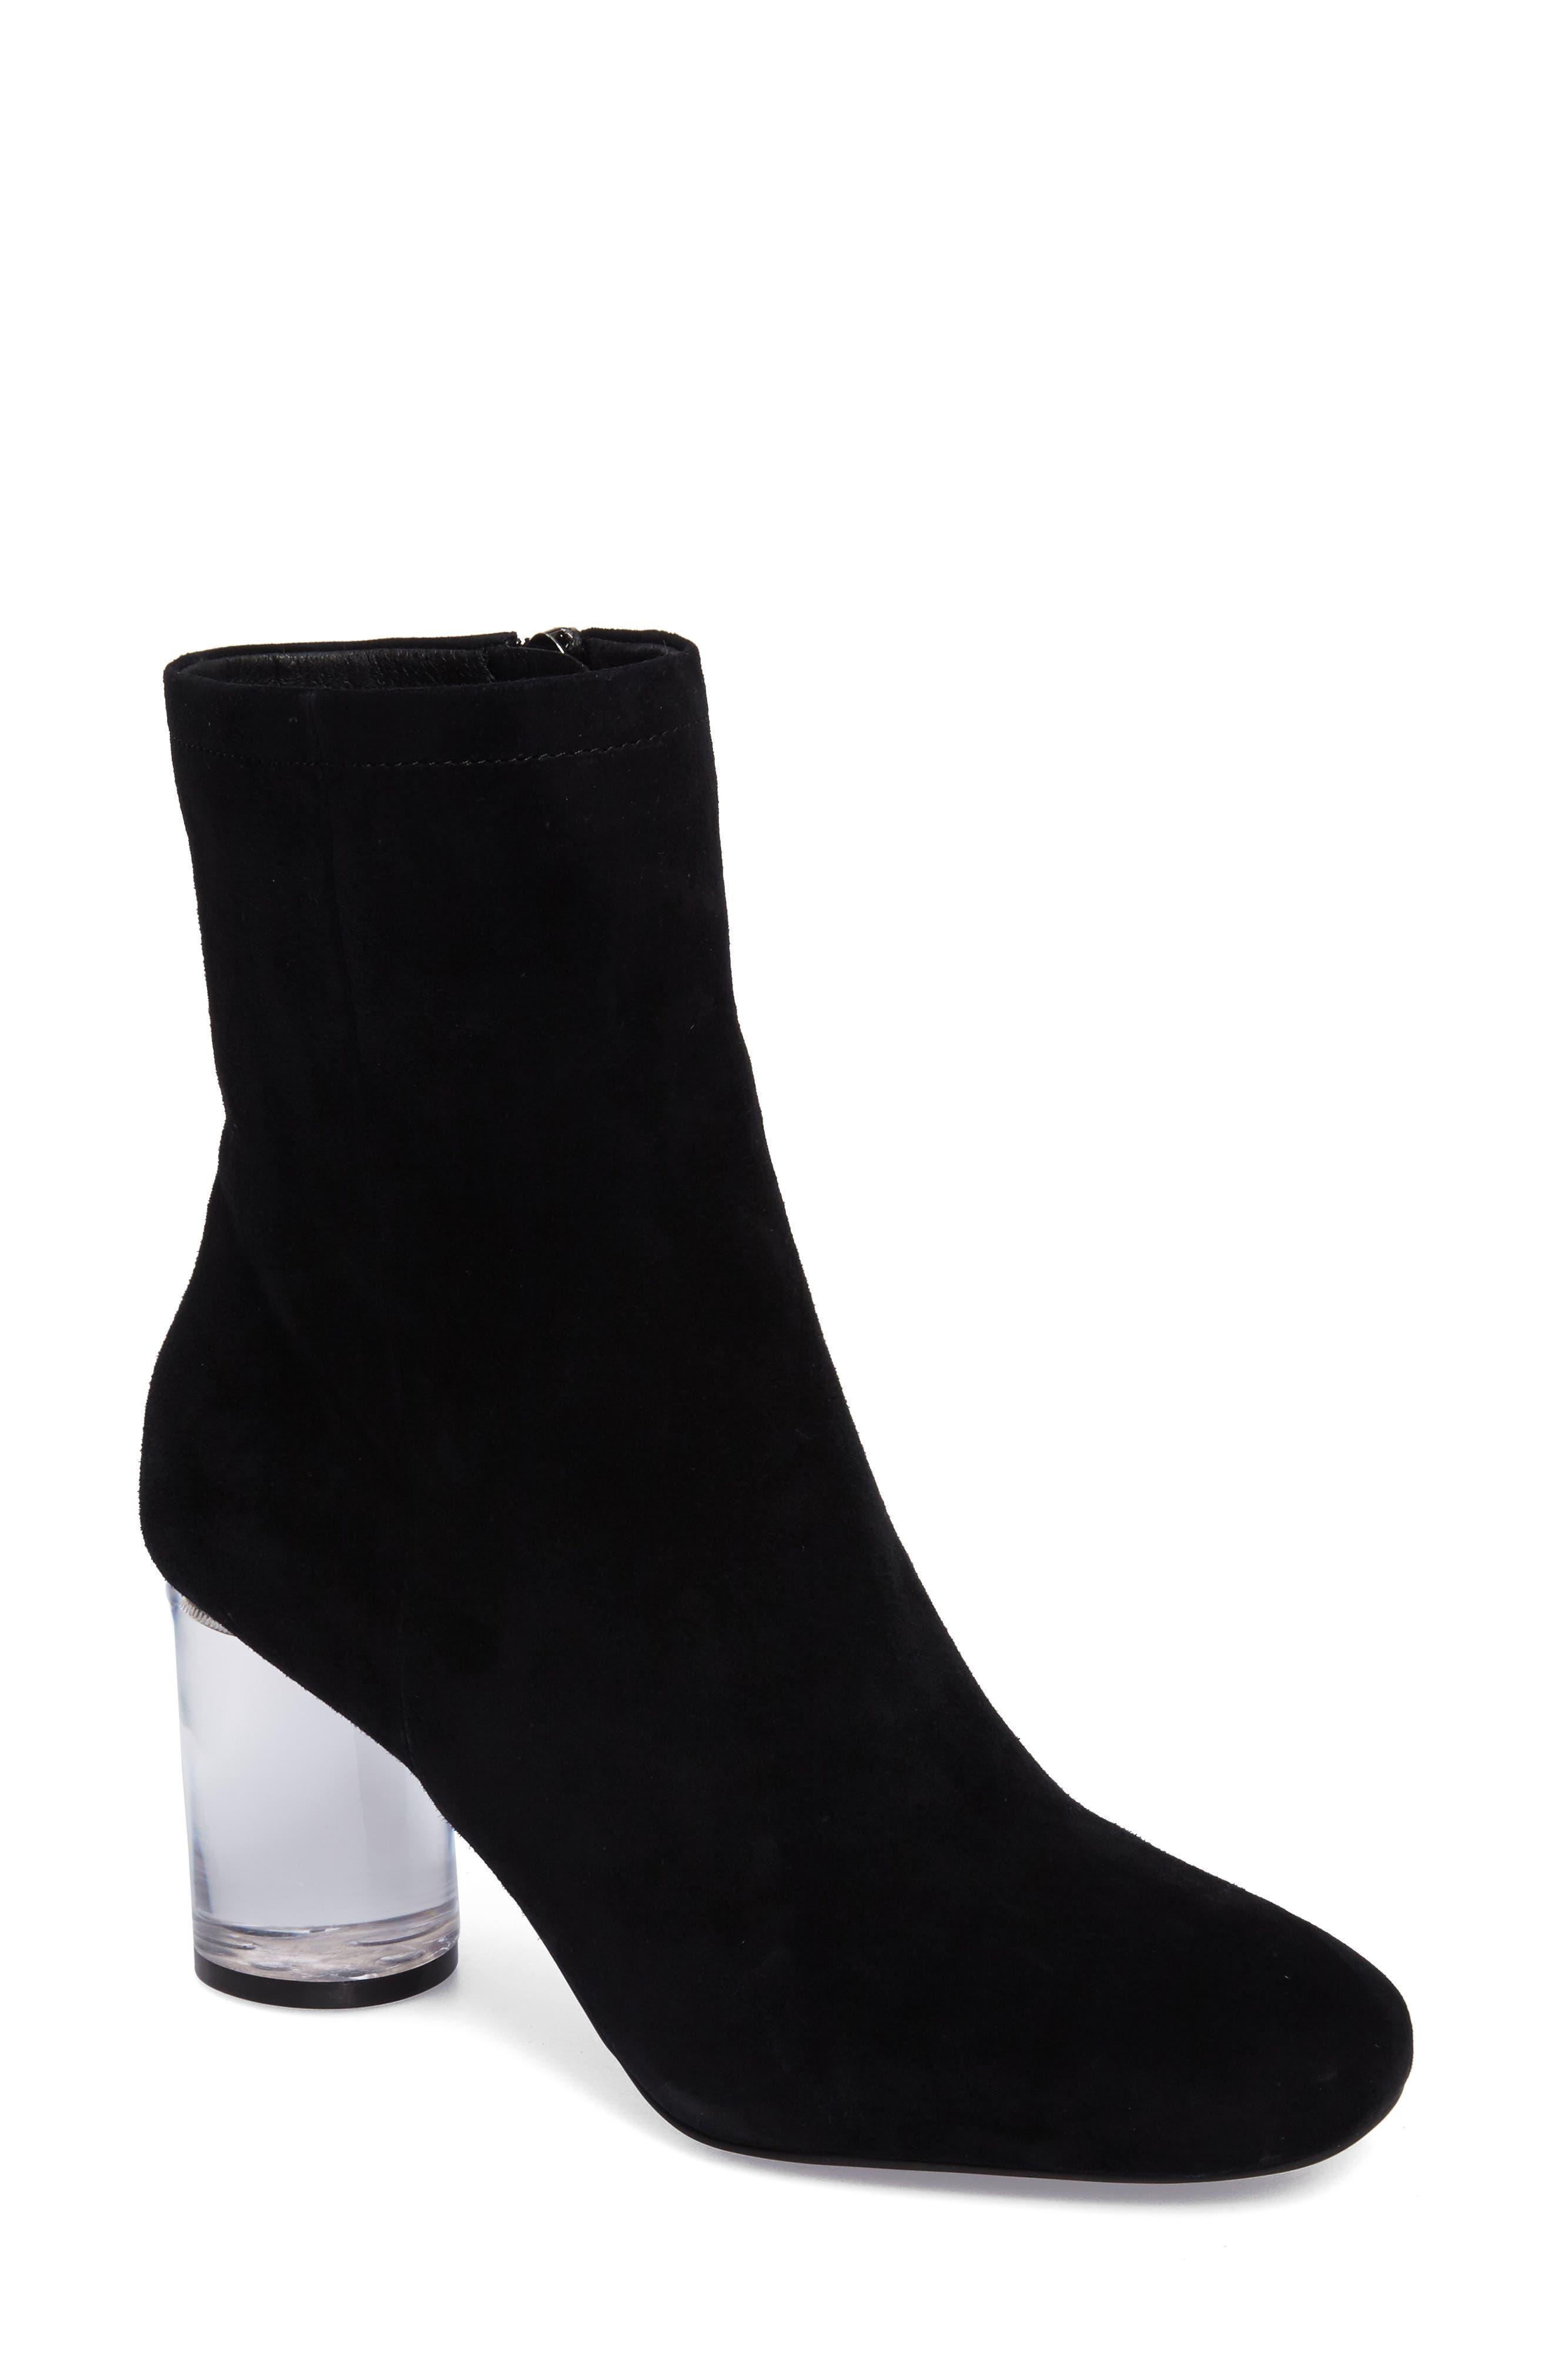 Main Image - Jessica Simpson Merta Column Heel Bootie (Women)